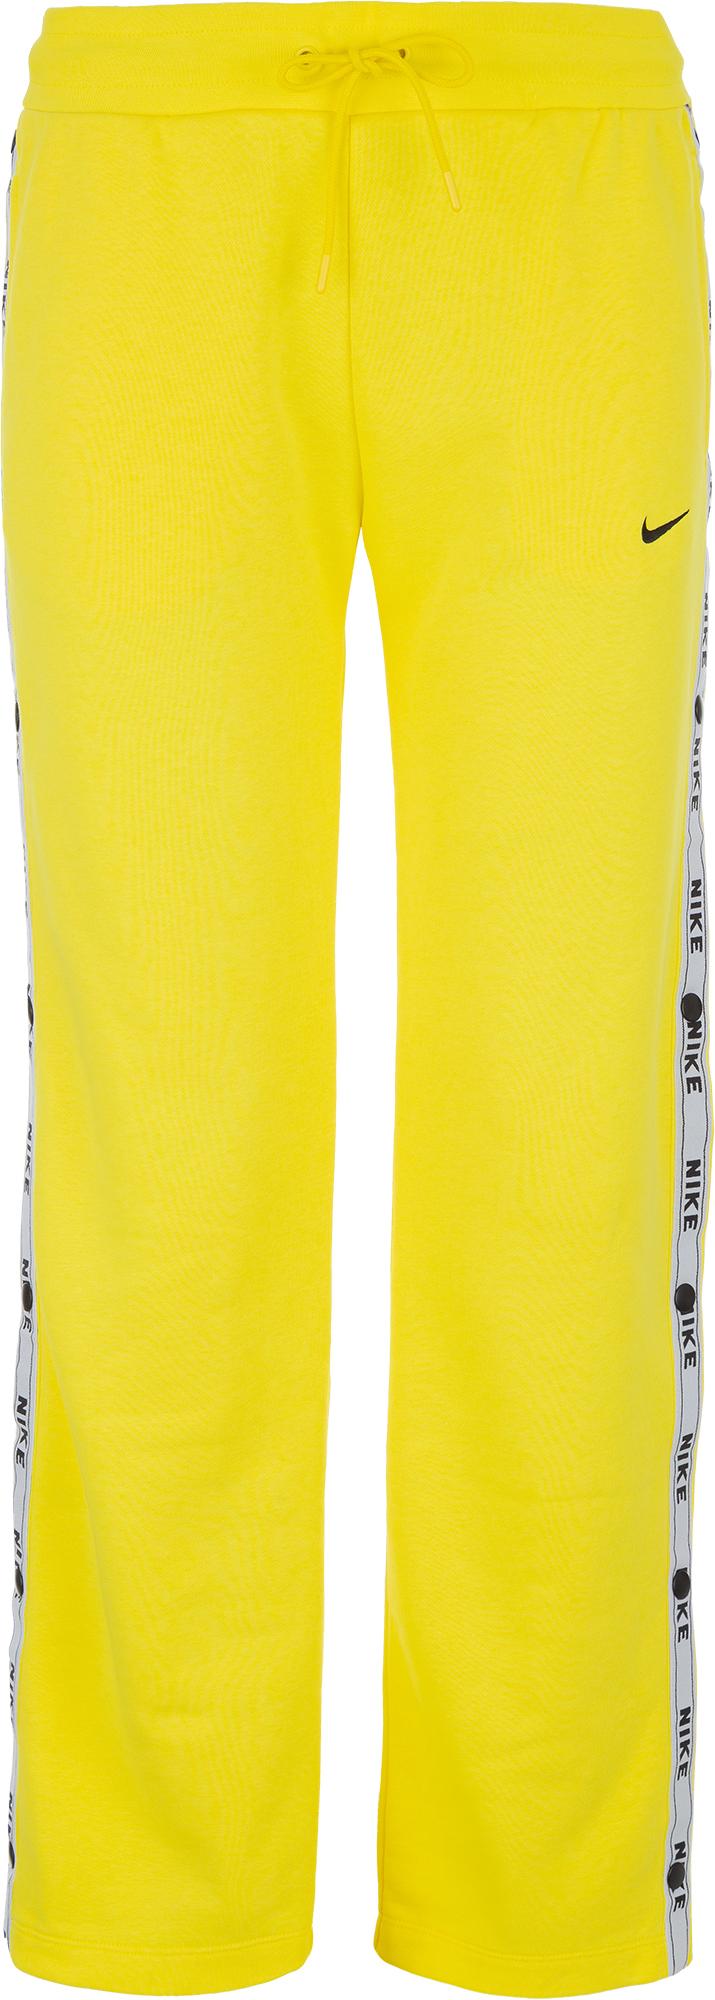 Nike Брюки женские Nike Sportswear, размер 46-48 nike бриджи женские nike sportswear vintage размер 48 50